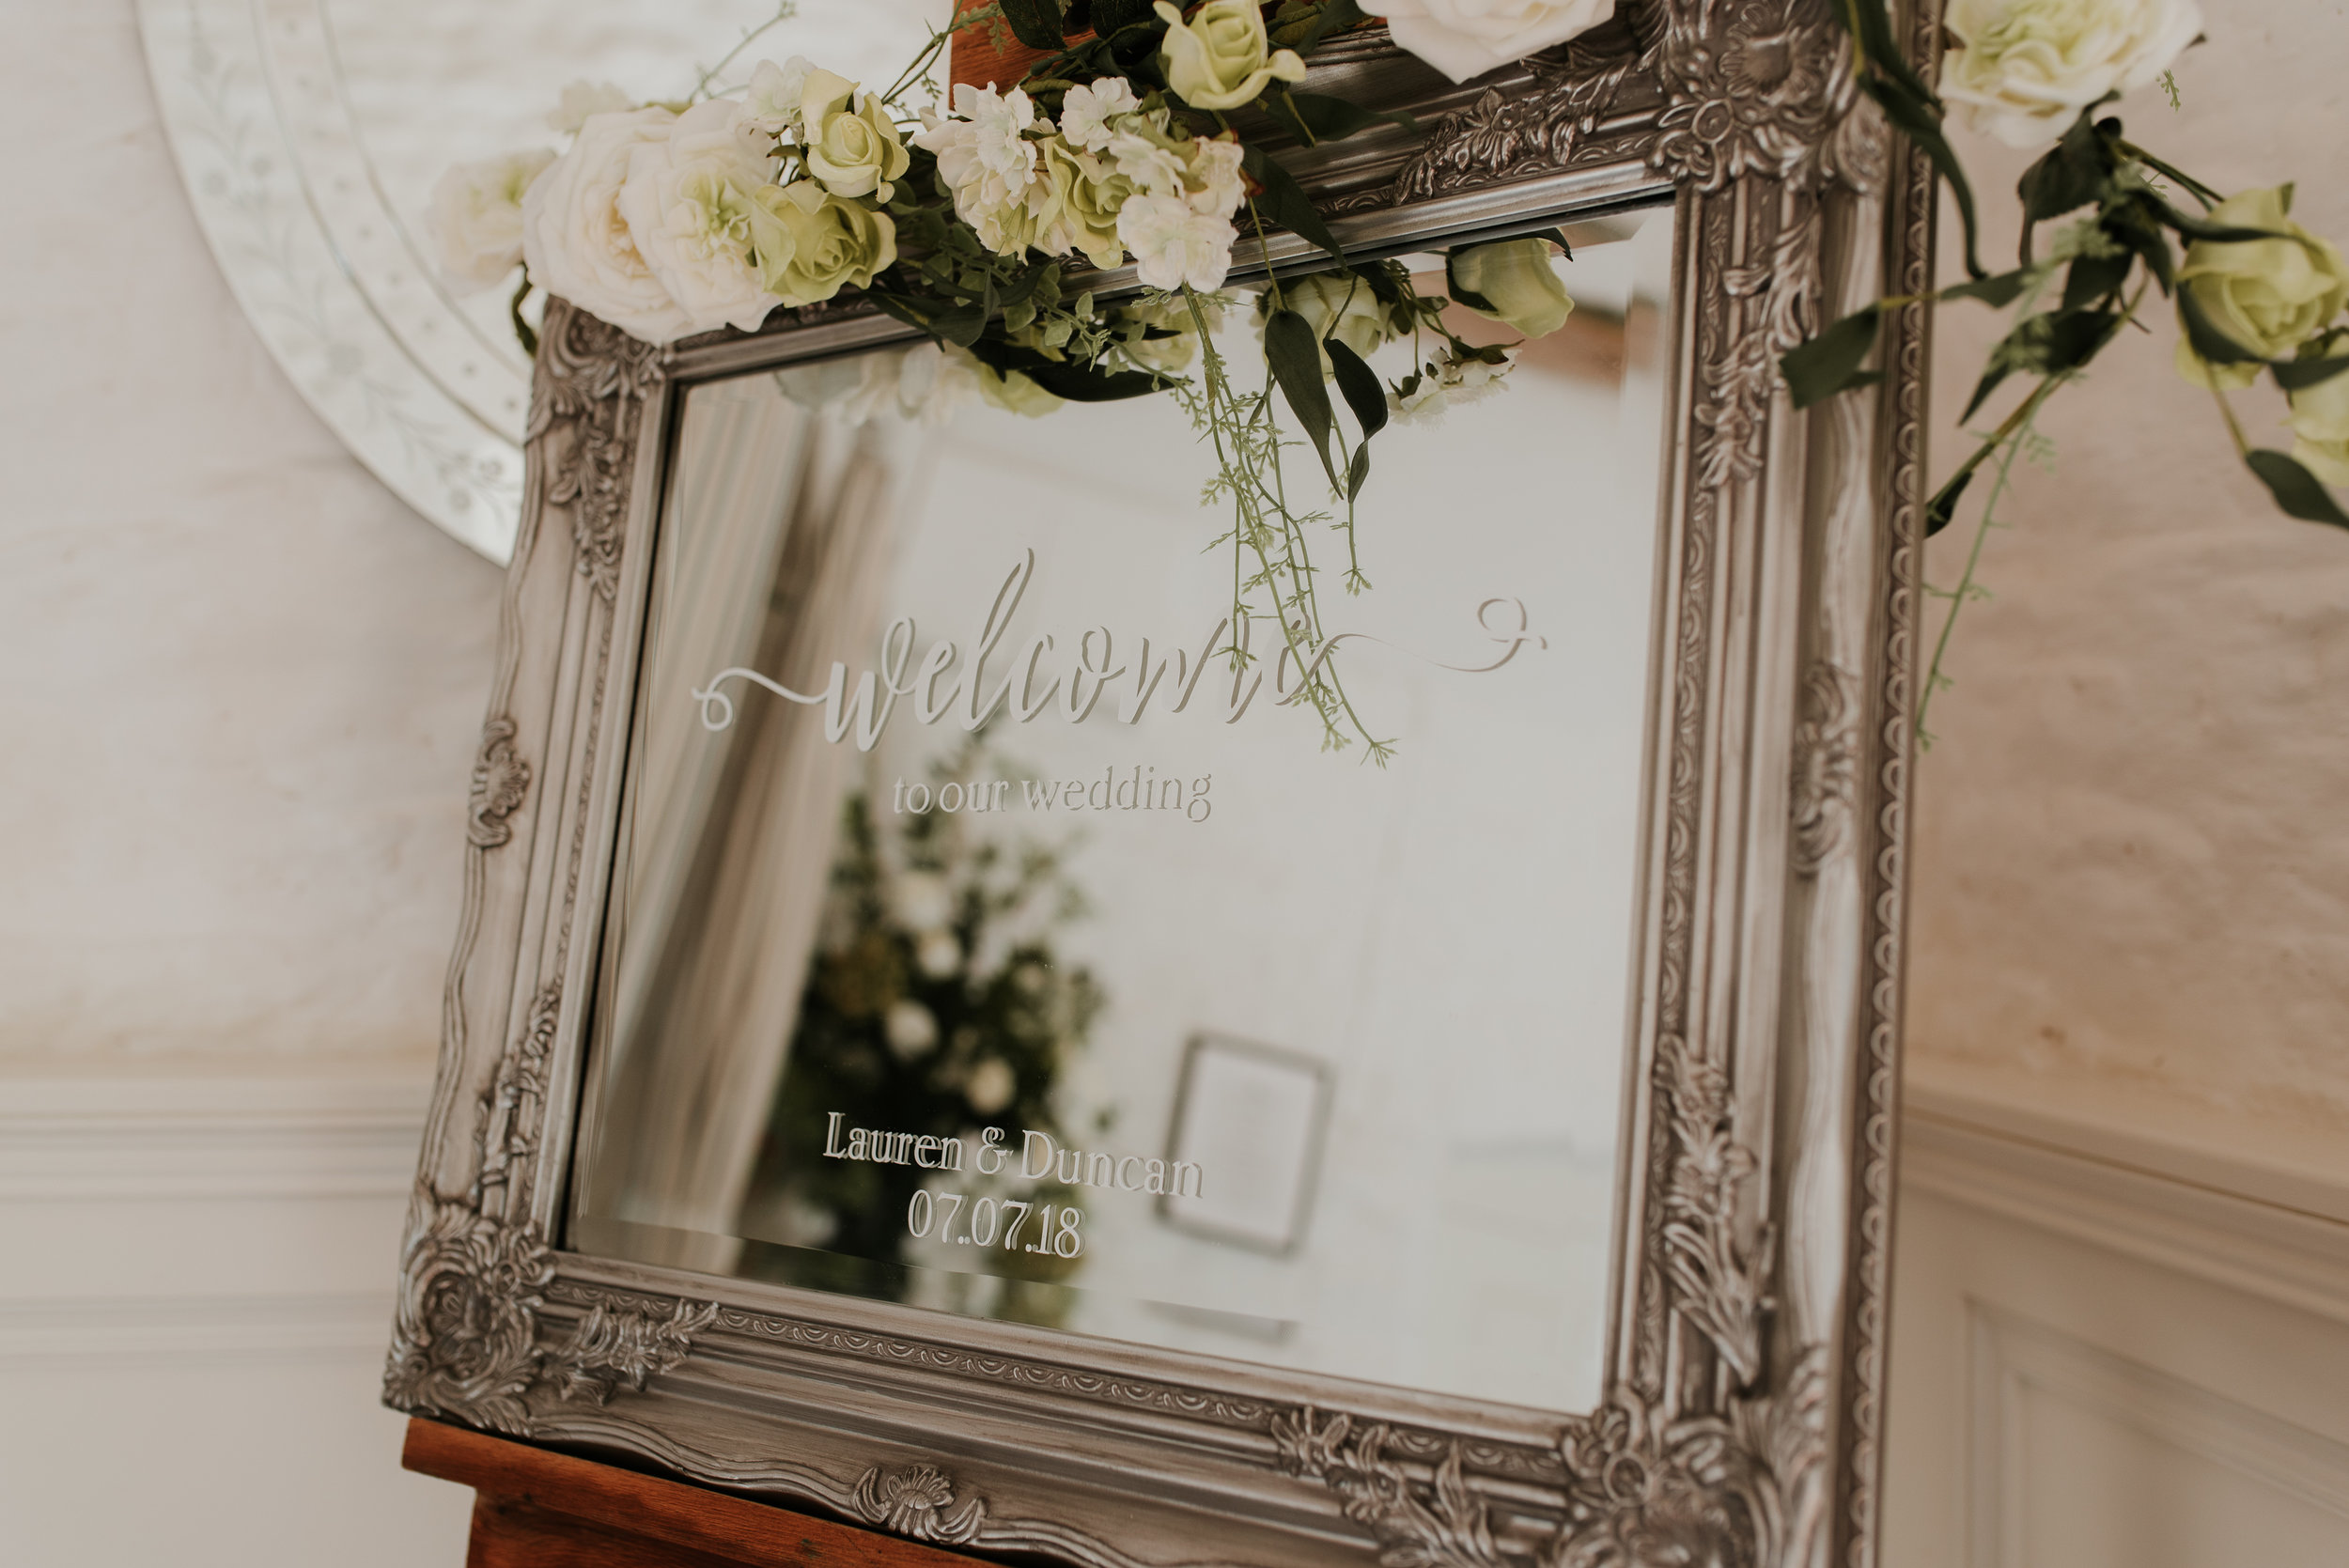 Oxfordshire-wedding-photographer-4.jpg